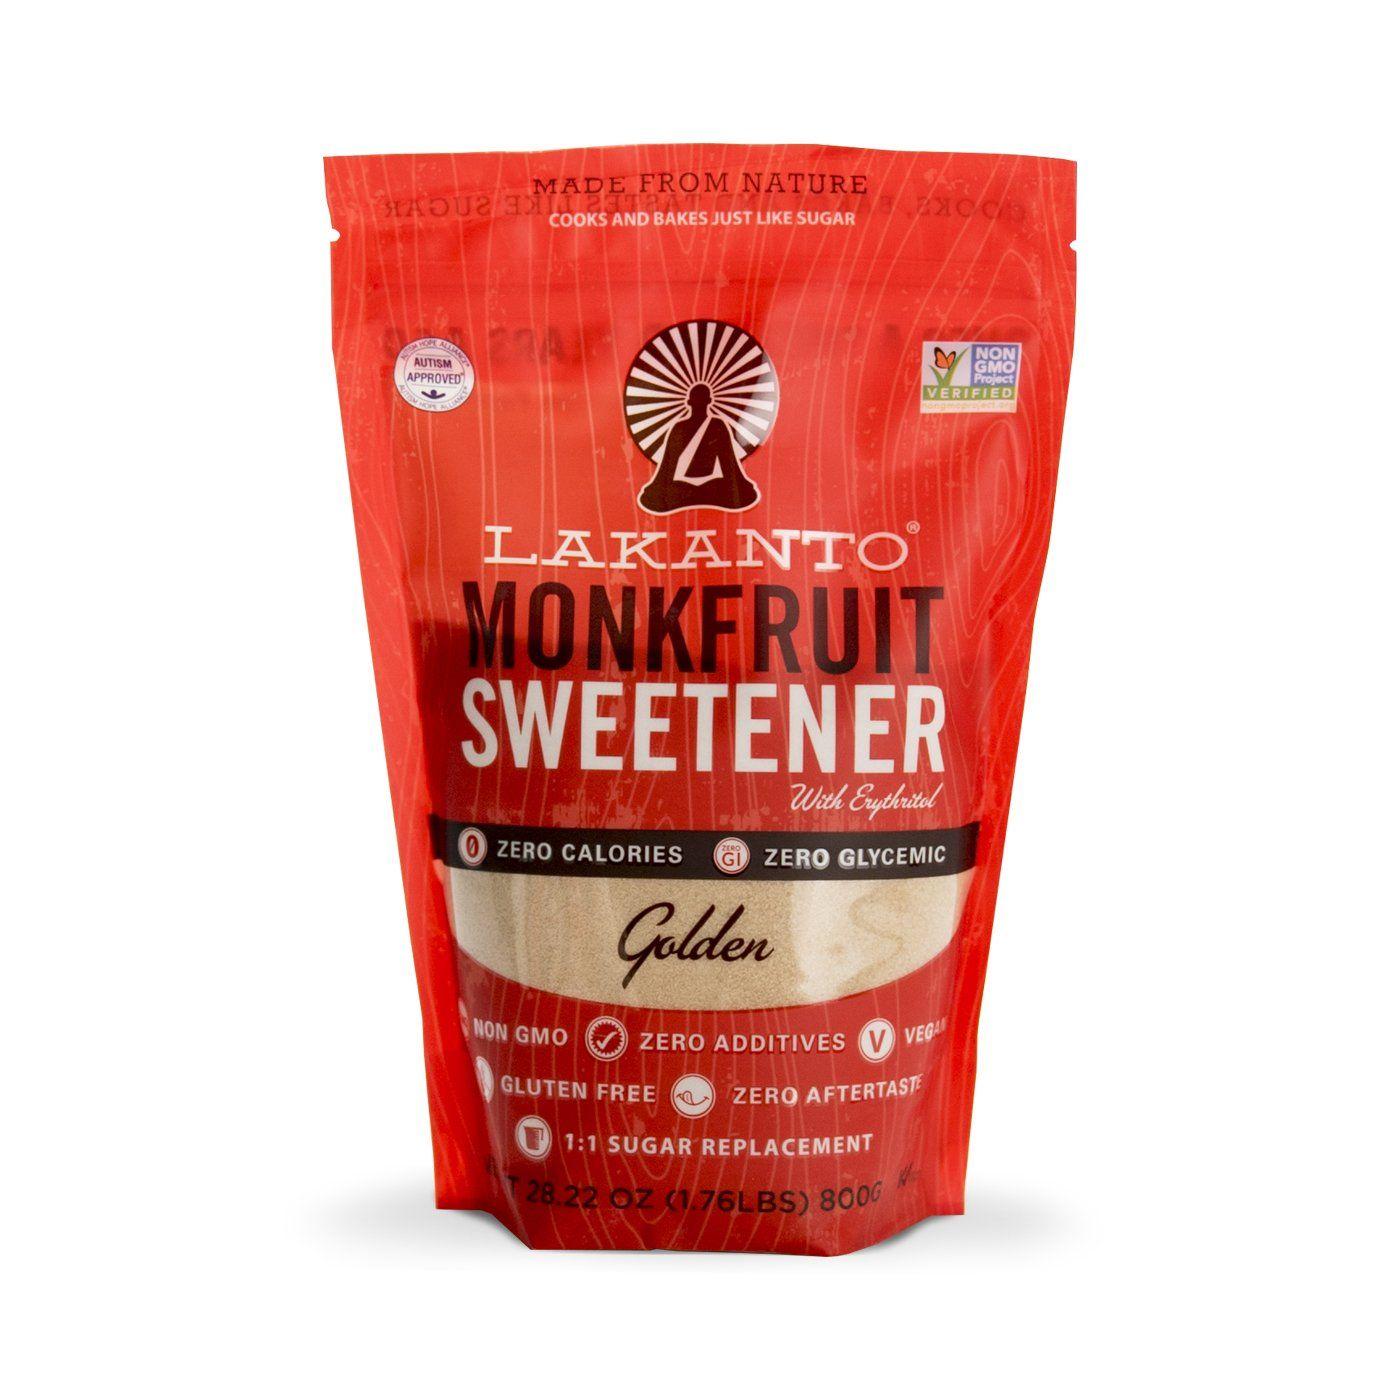 Golden monkfruit 11 sugar substitute low carb meals